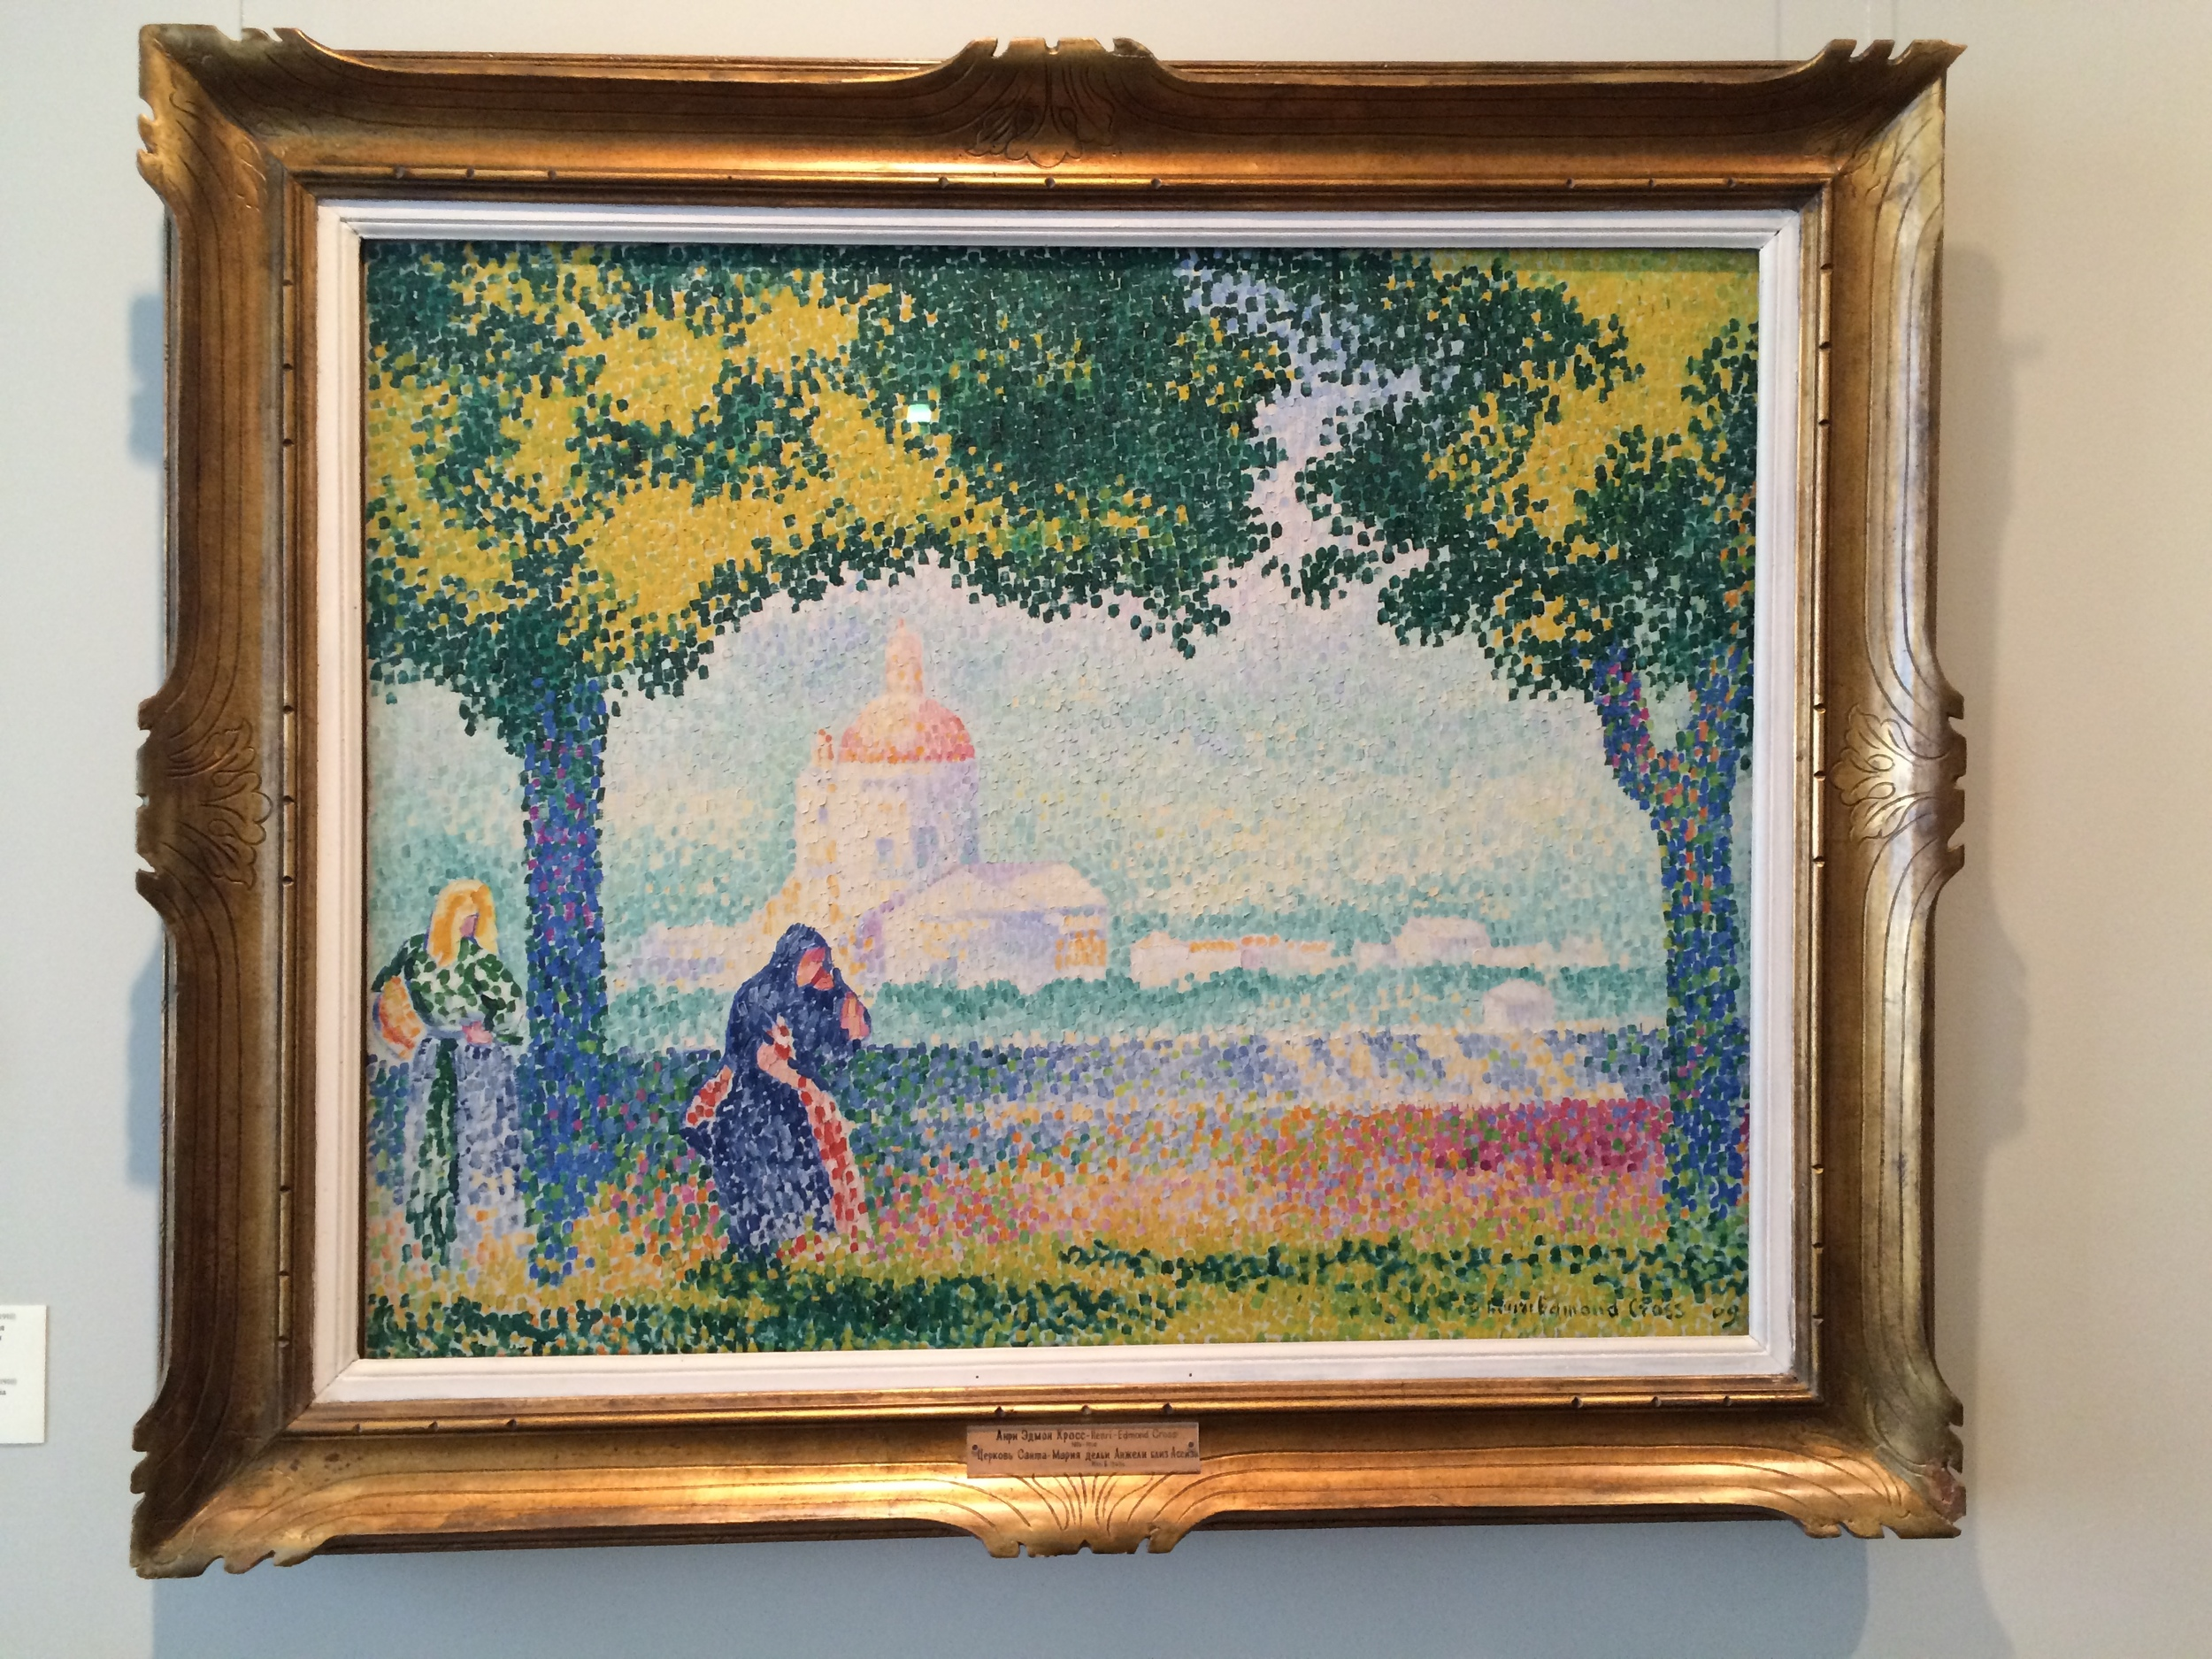 "Рис. 10аАнри Эдмон Кросс (Делакруа) ""Вид на церковь Санта Мария делли Анджели близ Ассизи"" (1909)"